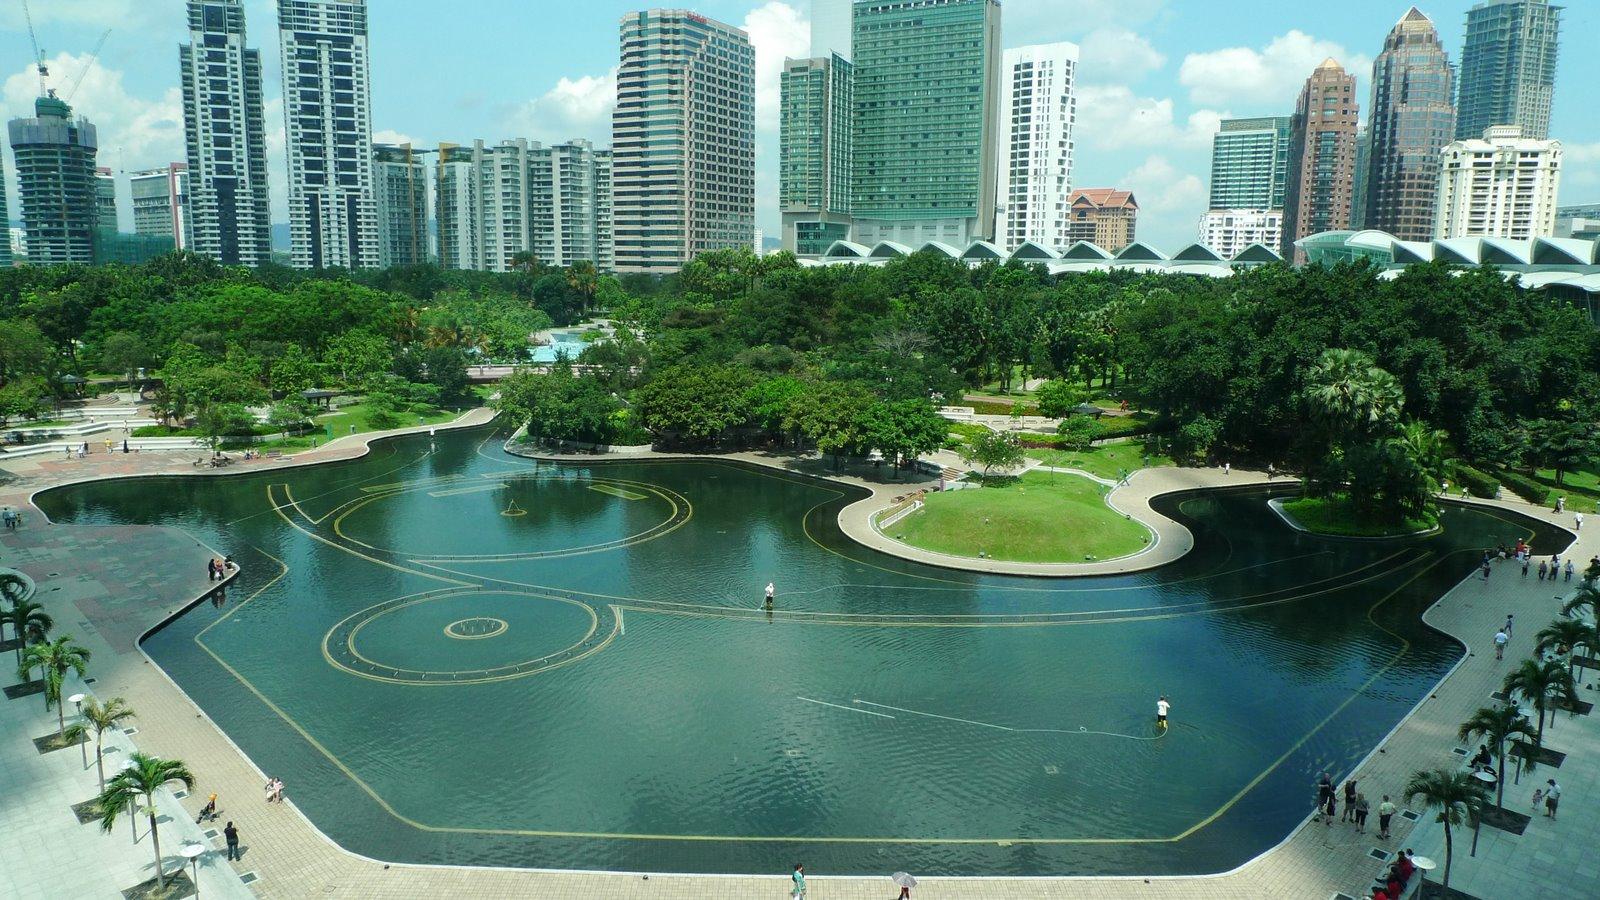 Tropical Gardening A Roberto Burle Marx Garden In Kuala Lumpur